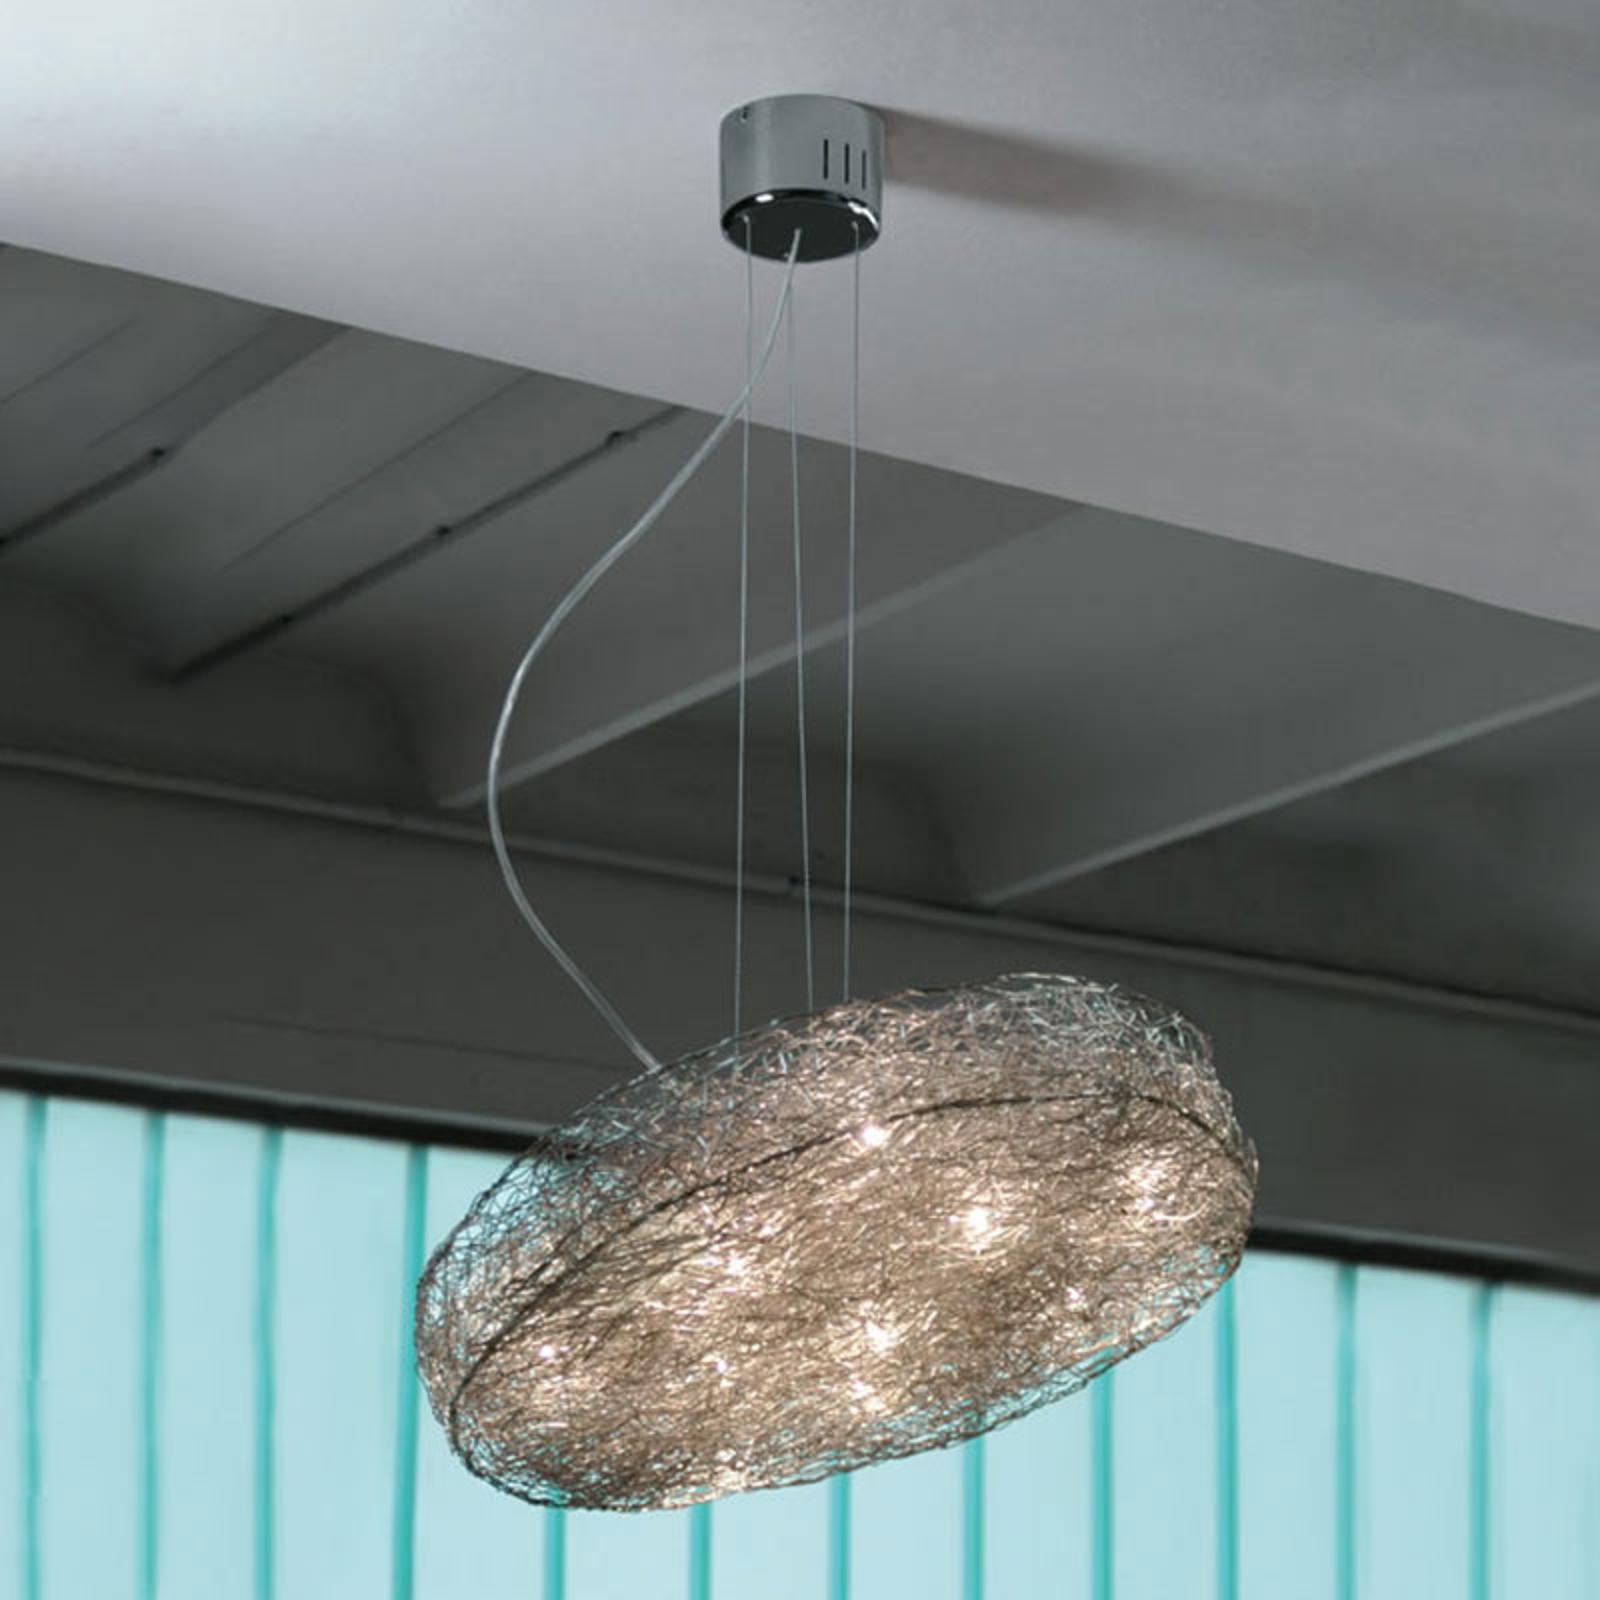 Knikerboker Rotola Designer-LED-Hängeleuchte